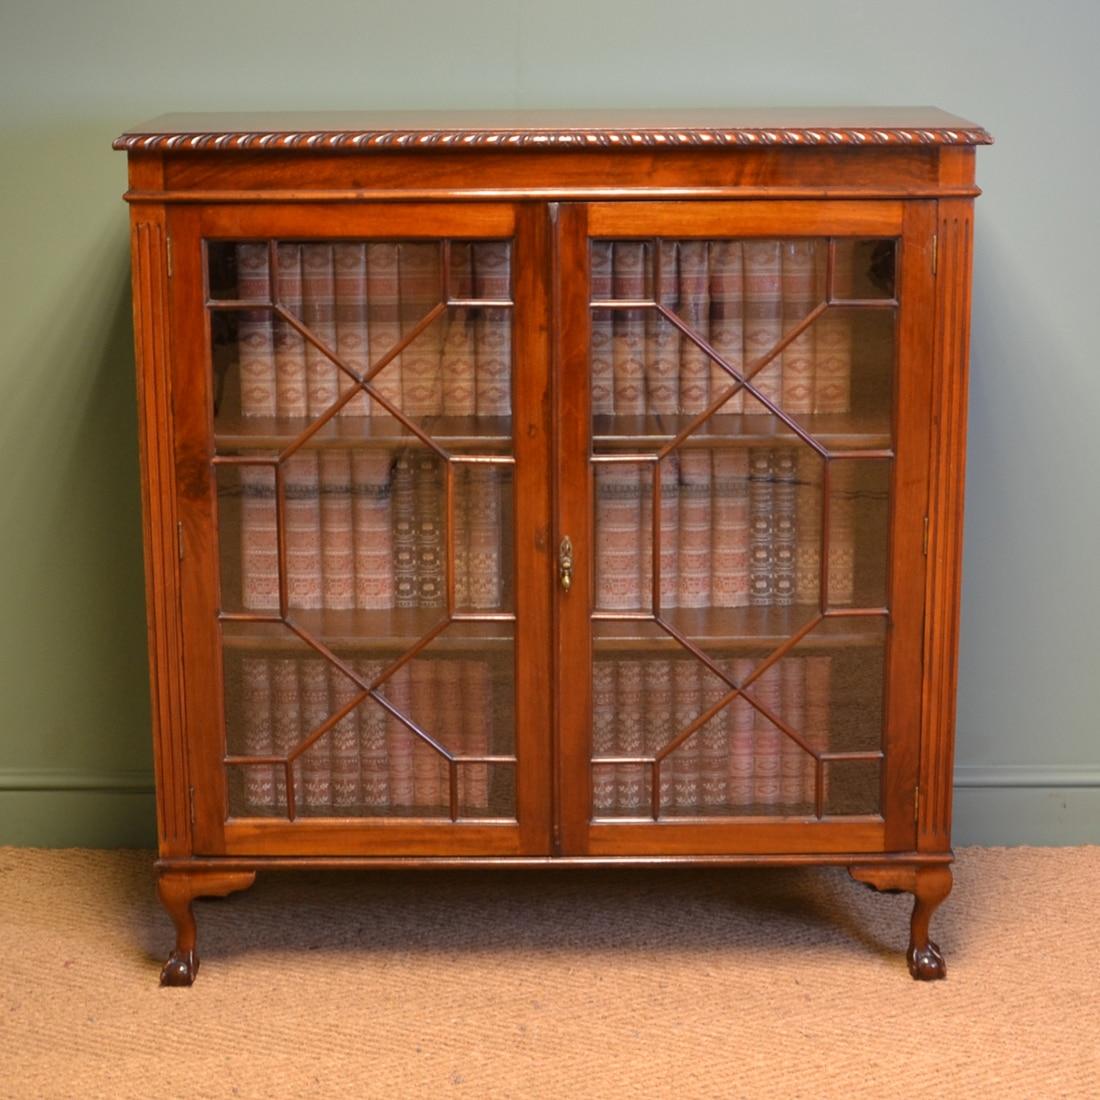 Quality Edwardian Mahogany Antique Glazed Bookcase by S&H Jewell